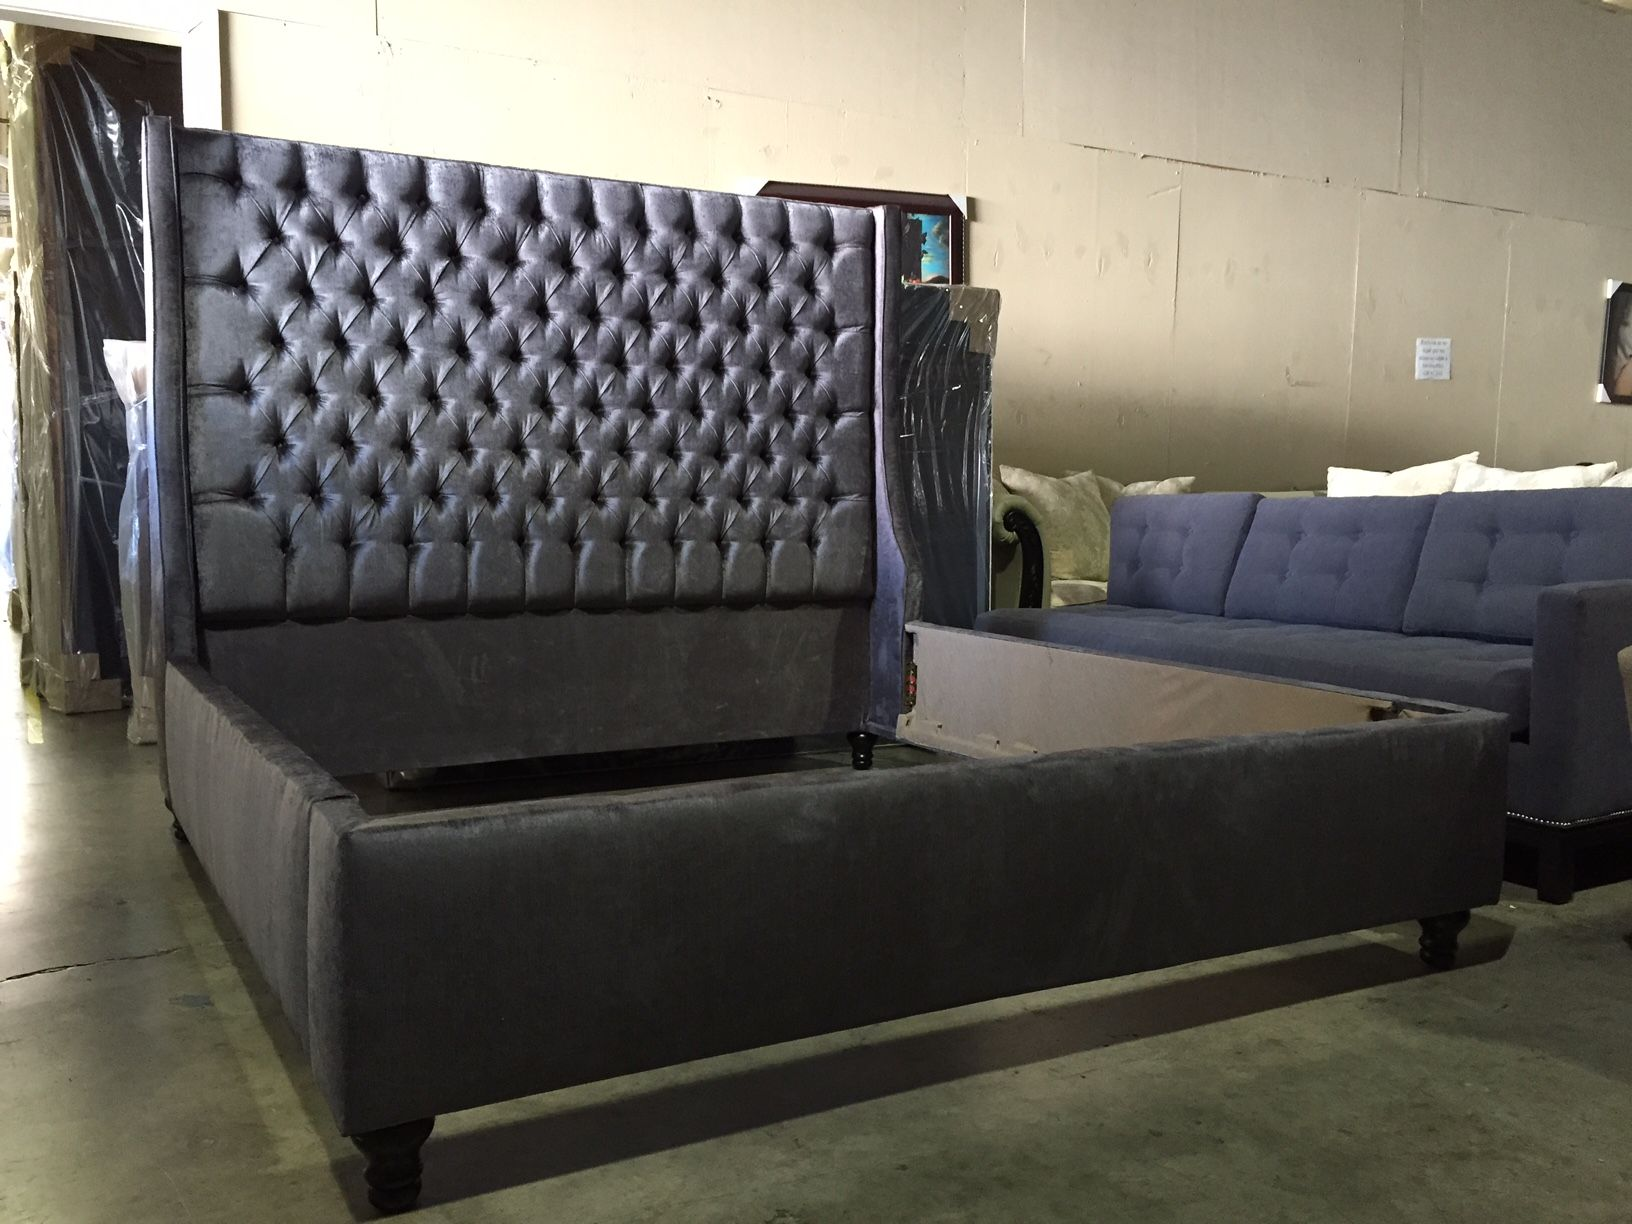 Upholstered Wingback Bed In Charcoal Velvet With Diamond Tufting - Diamond tufted steel grey velvet wingback headboard king extra tall